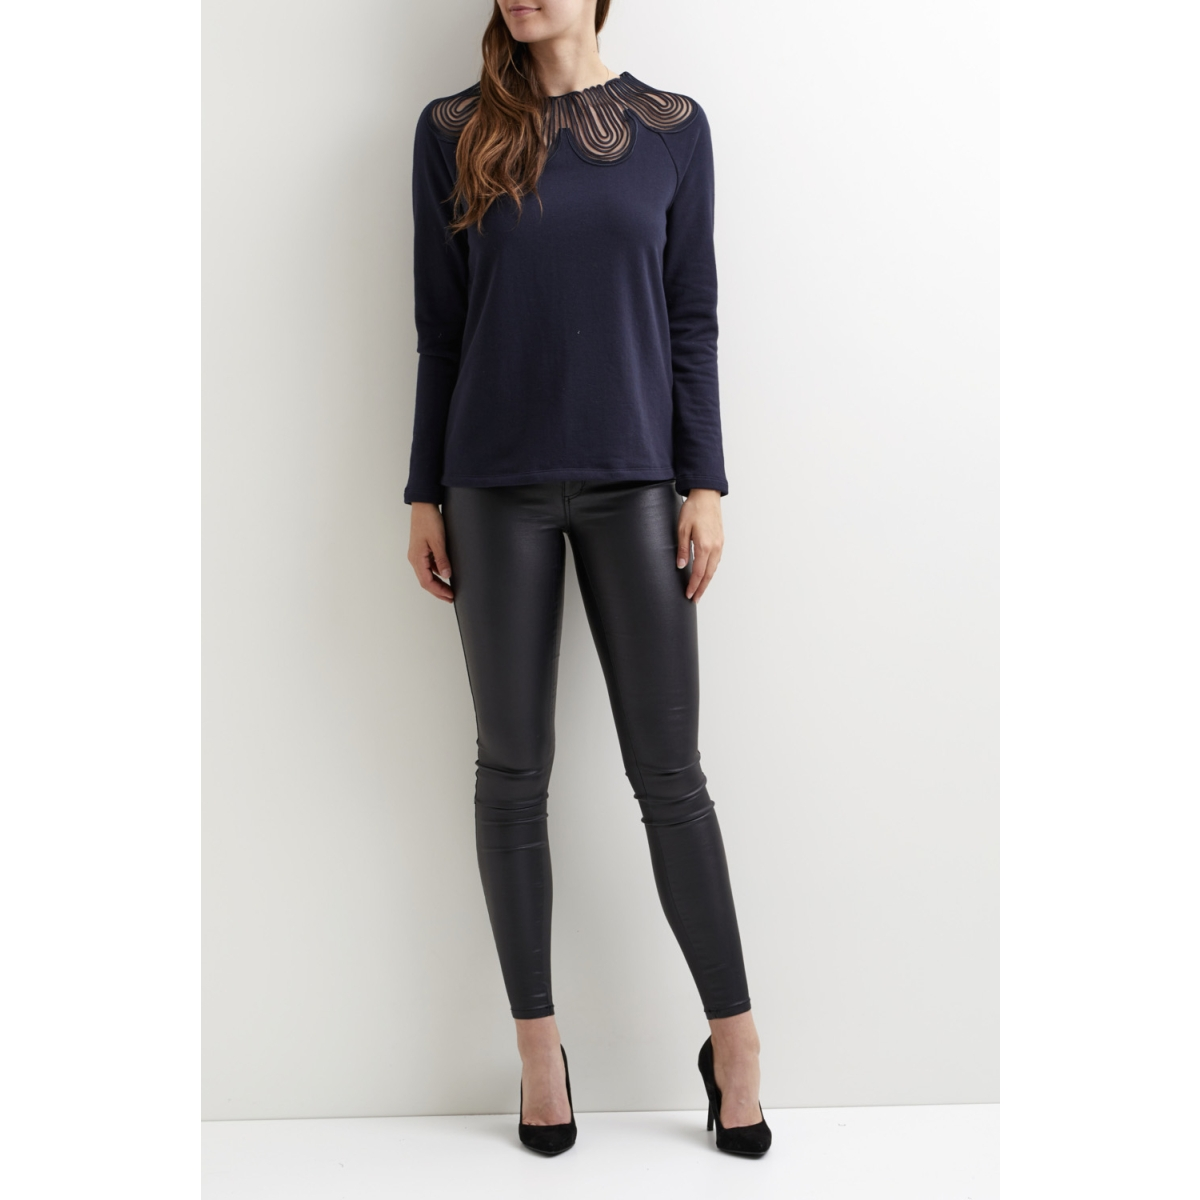 vimista l/s neck lace top/dc 14043175 vila sweater dark navy